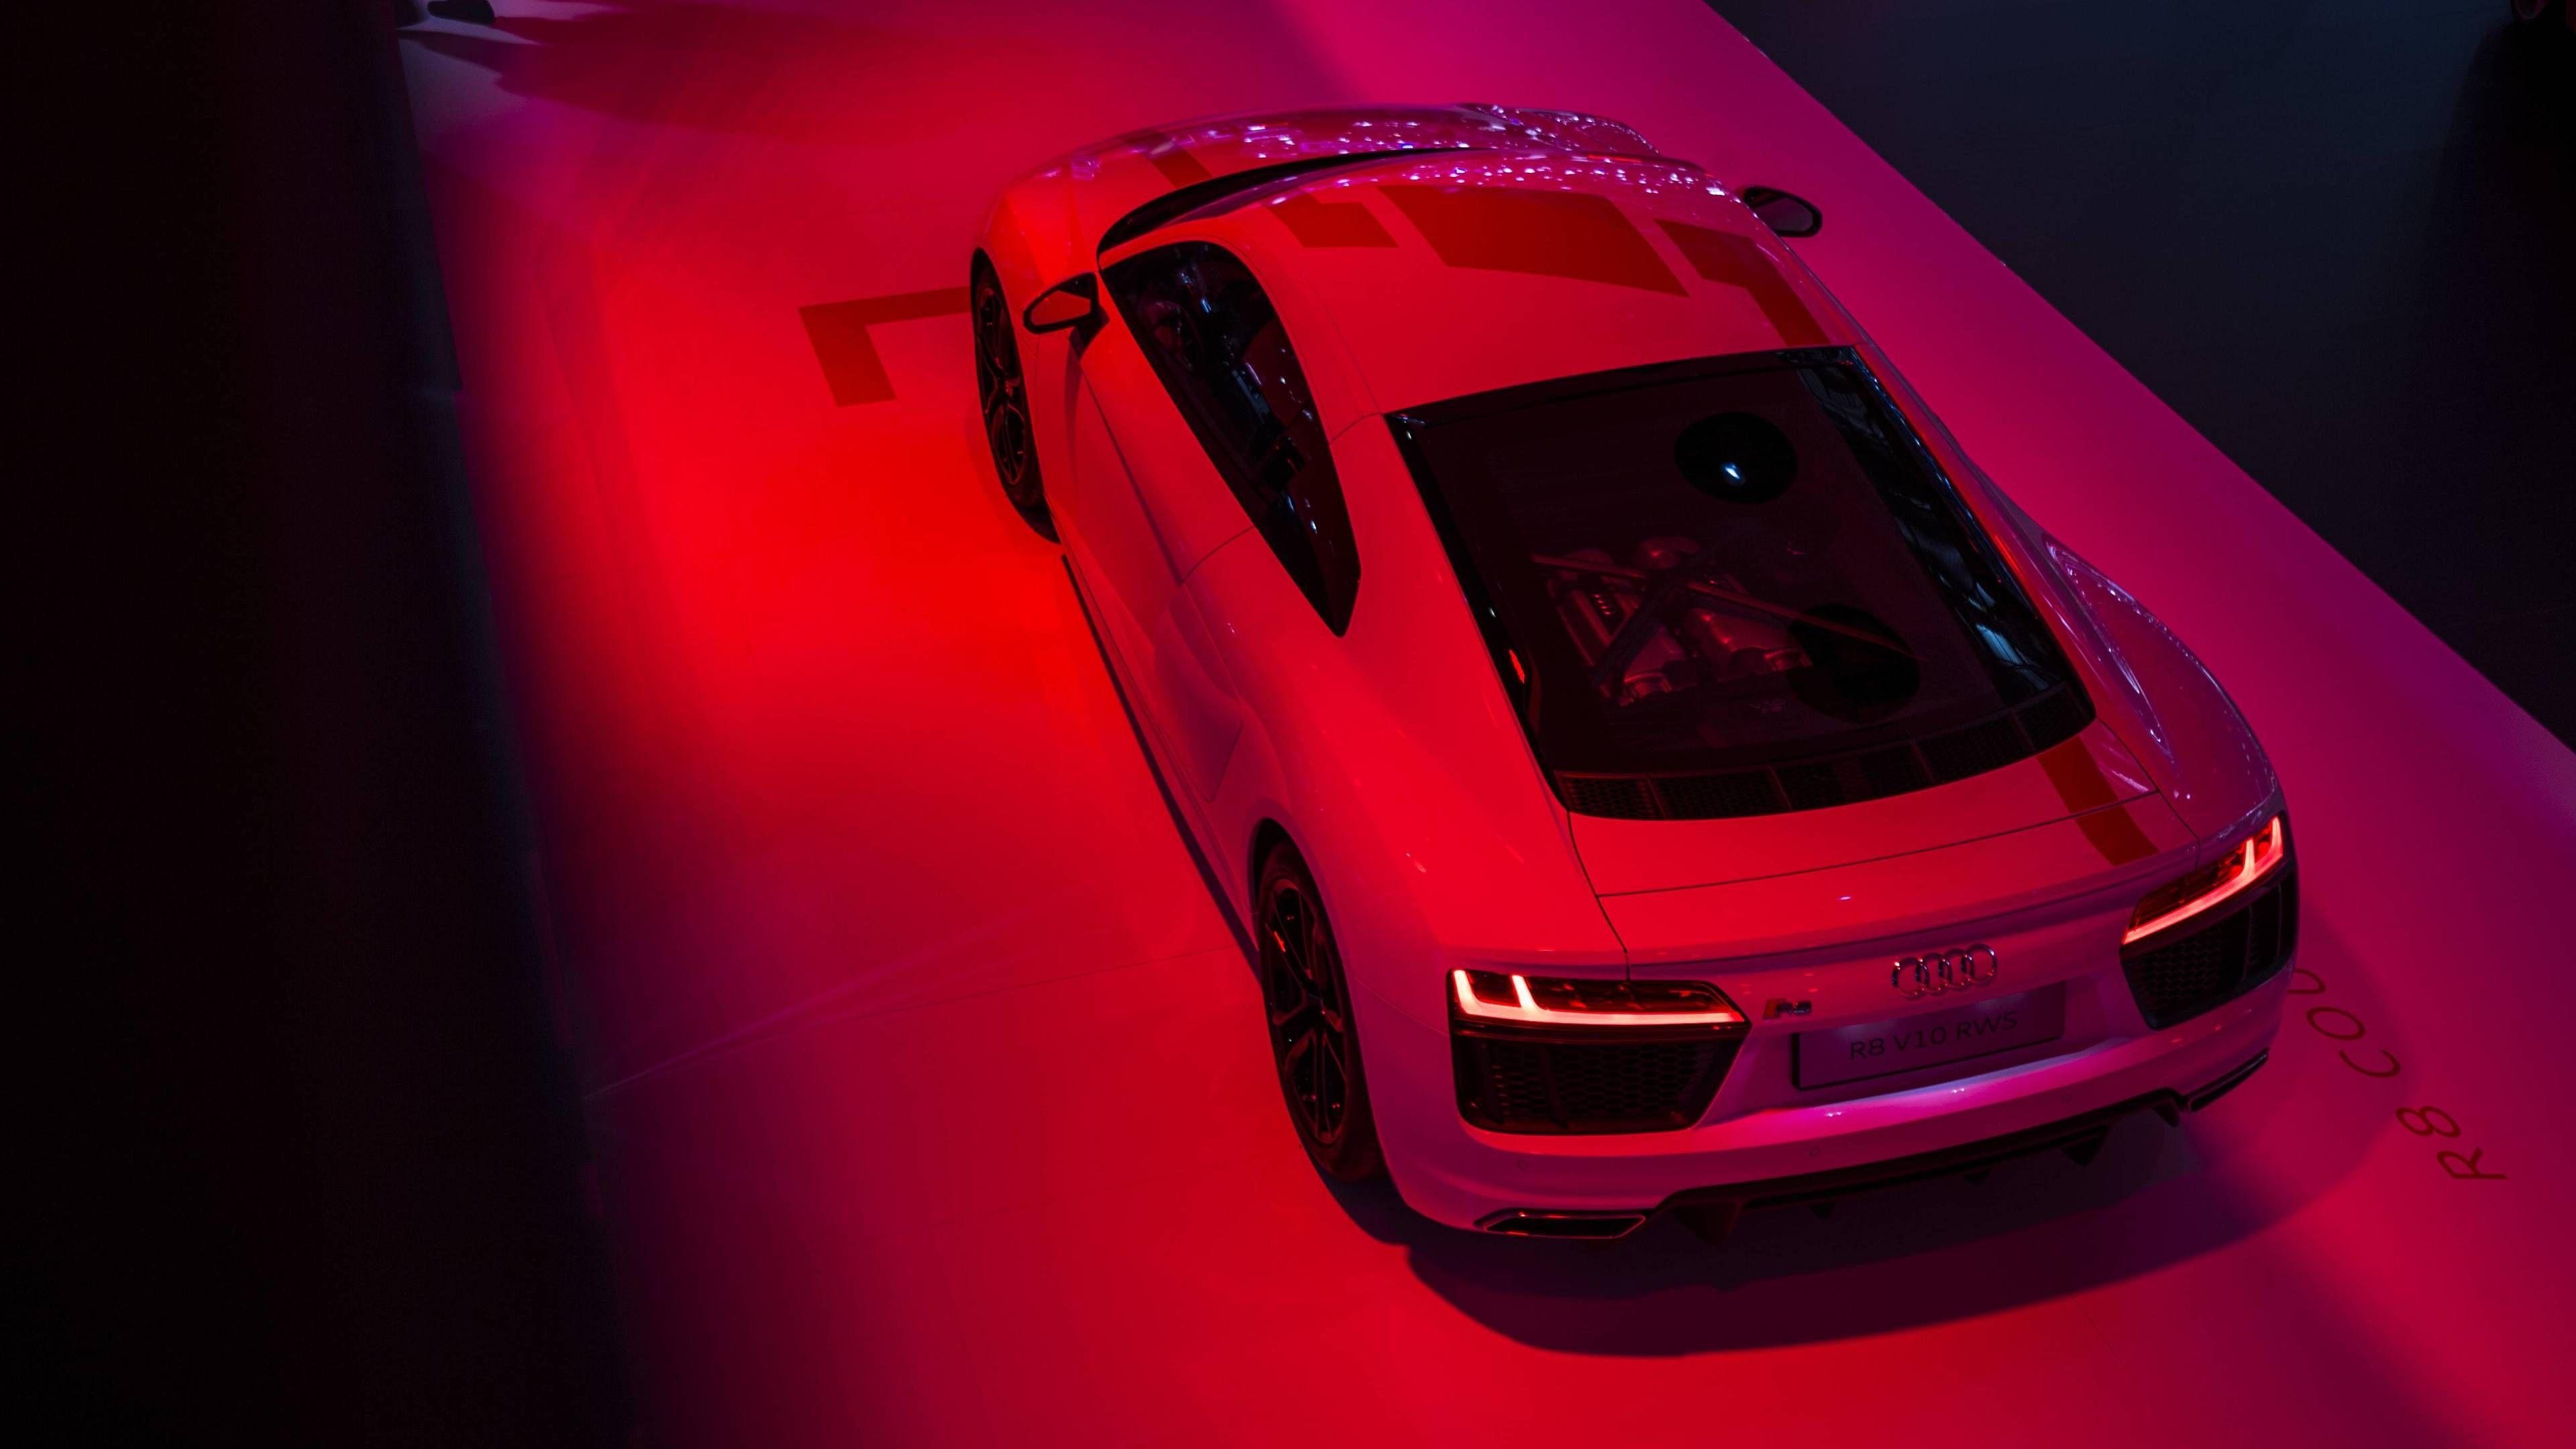 2018 Audi R8 V10 Rws 4k Reddit Wallpapers Hd Wallpapers Cars Wallpapers Audi Wallpapers Audi R8 Wallpapers Audi R8 V10 Audi Wallpapers Audi R8 Wallpapers